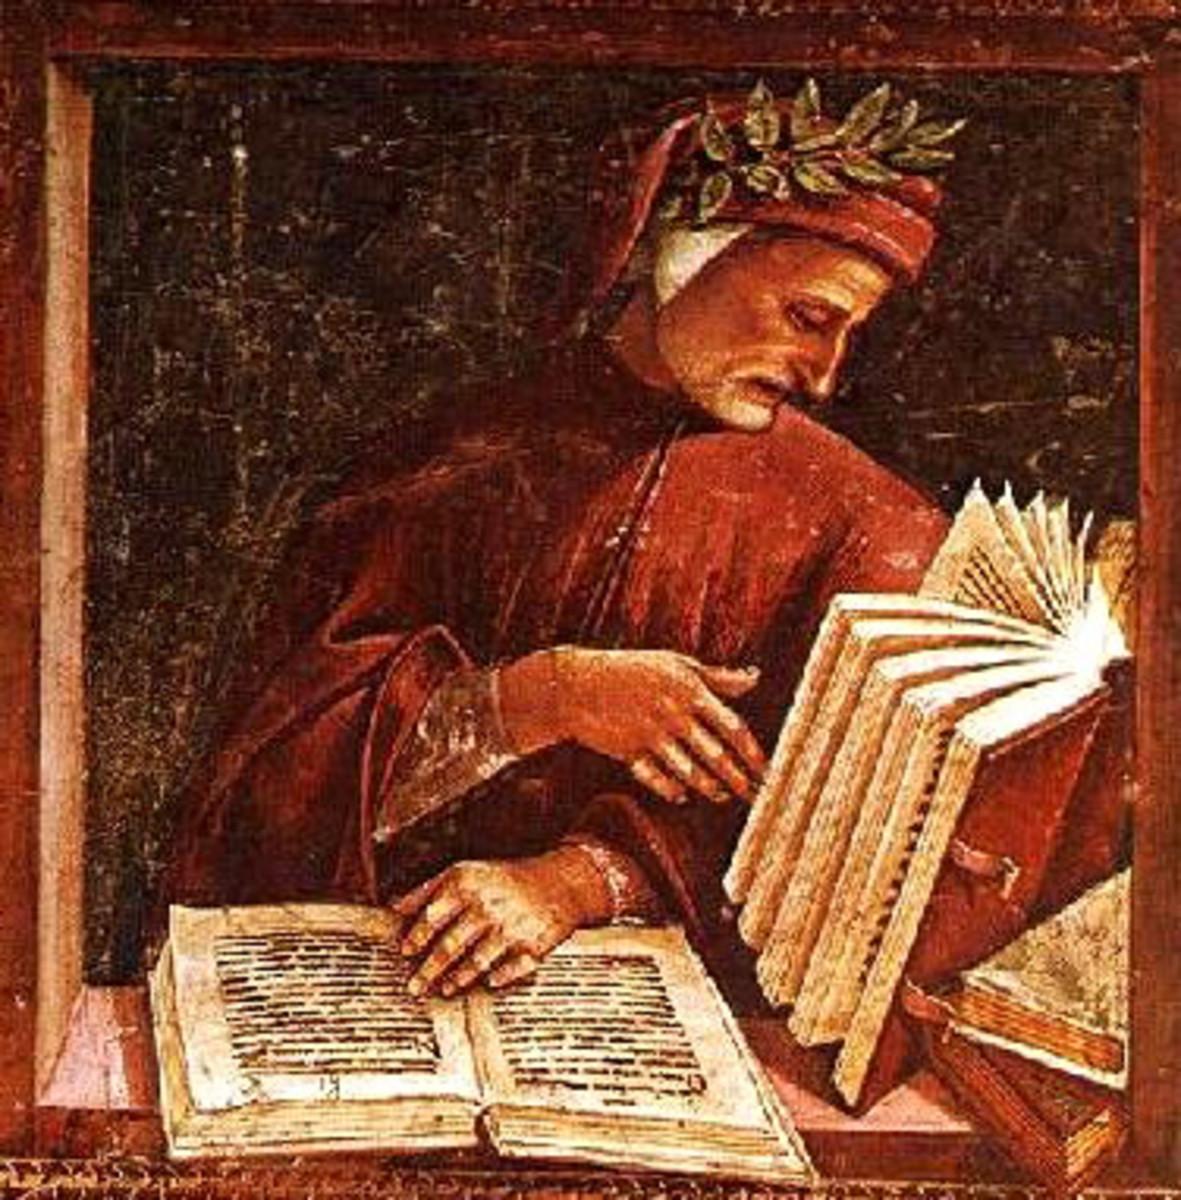 summary-of-the-book-the-divine-comedy-dante-alighieri